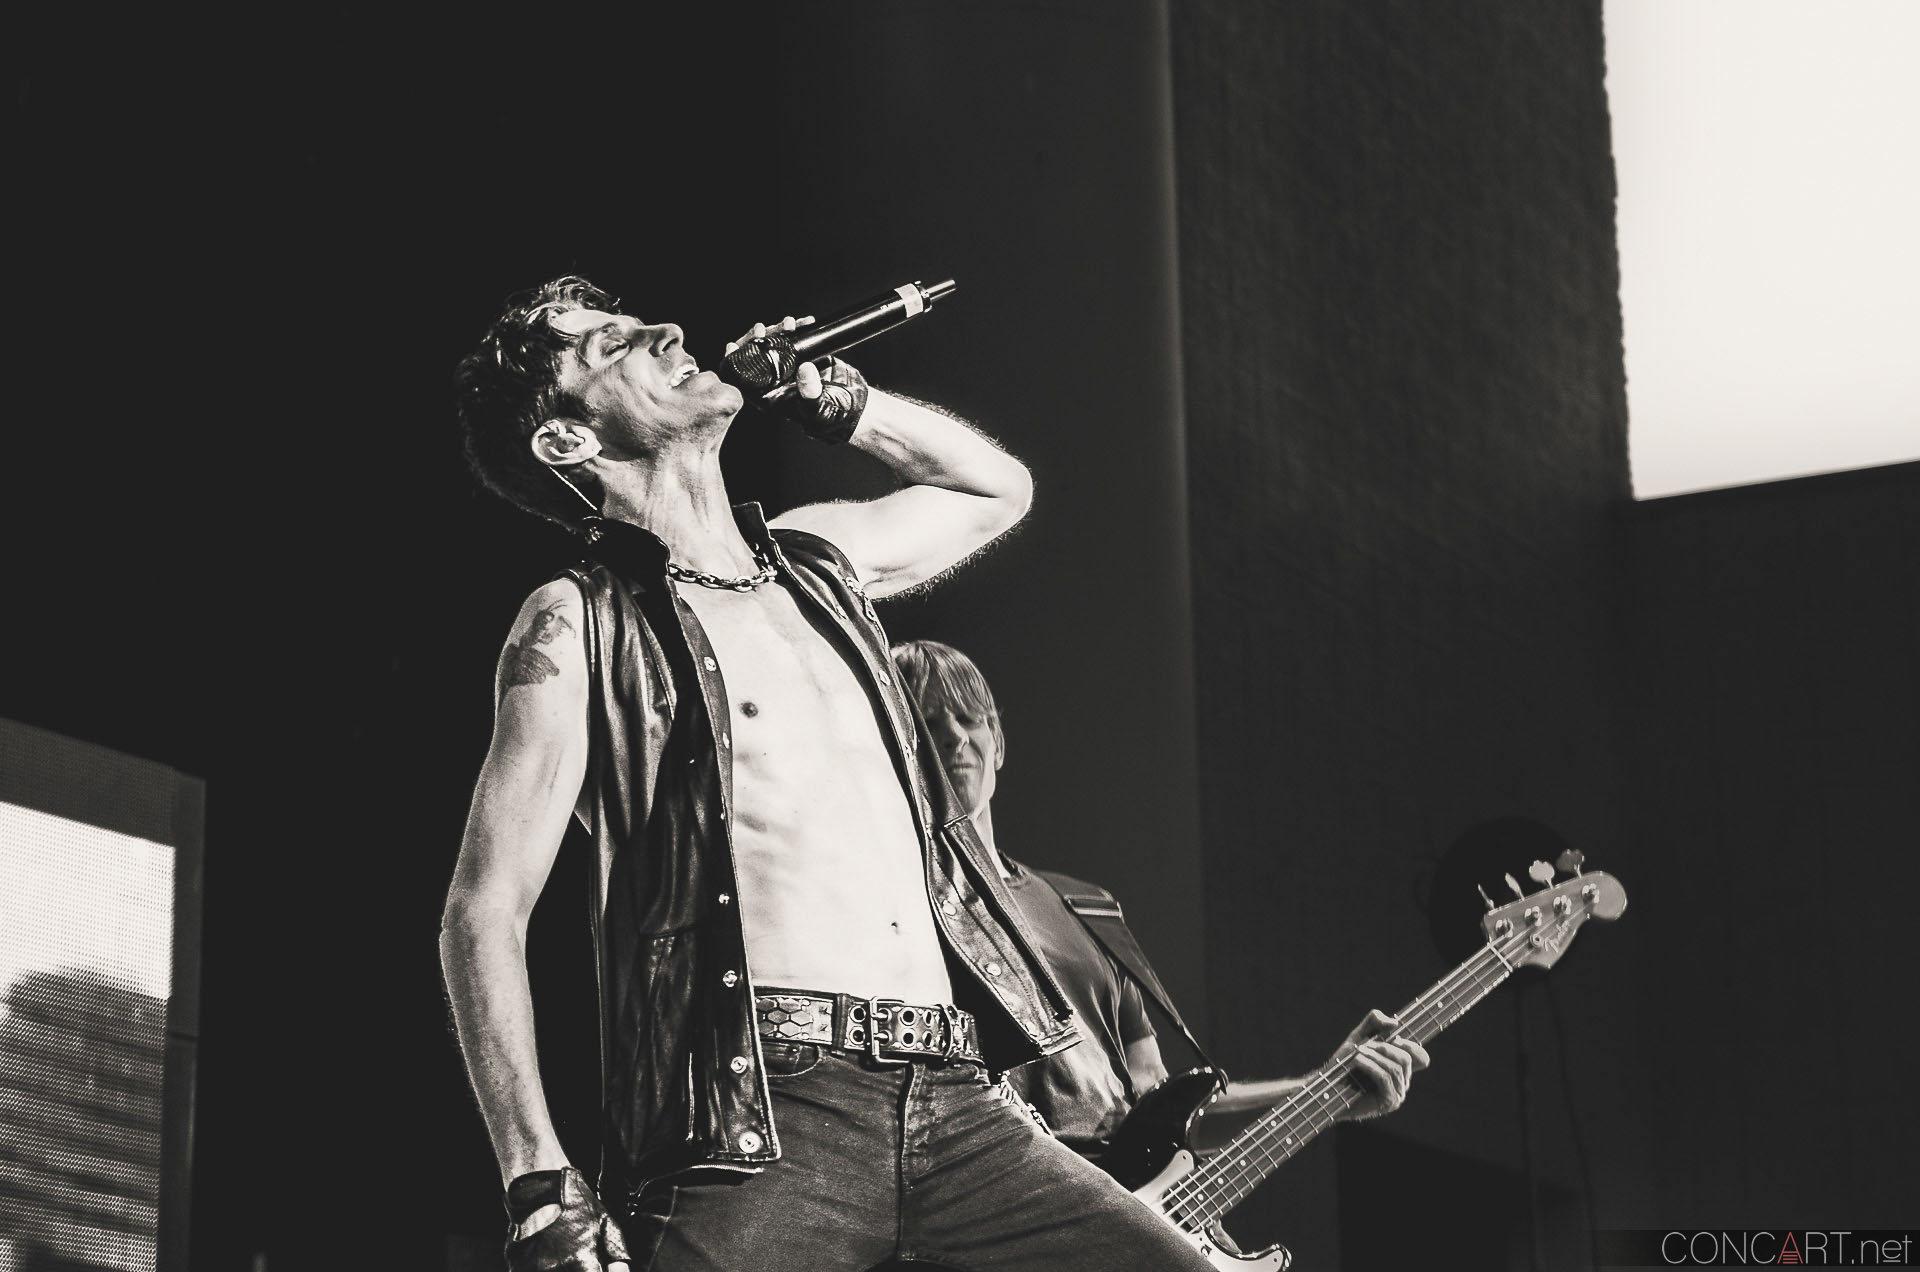 janes_addiction_live_x103_rockstar_uproar_festival_klipsch_indianapolis_2013-13